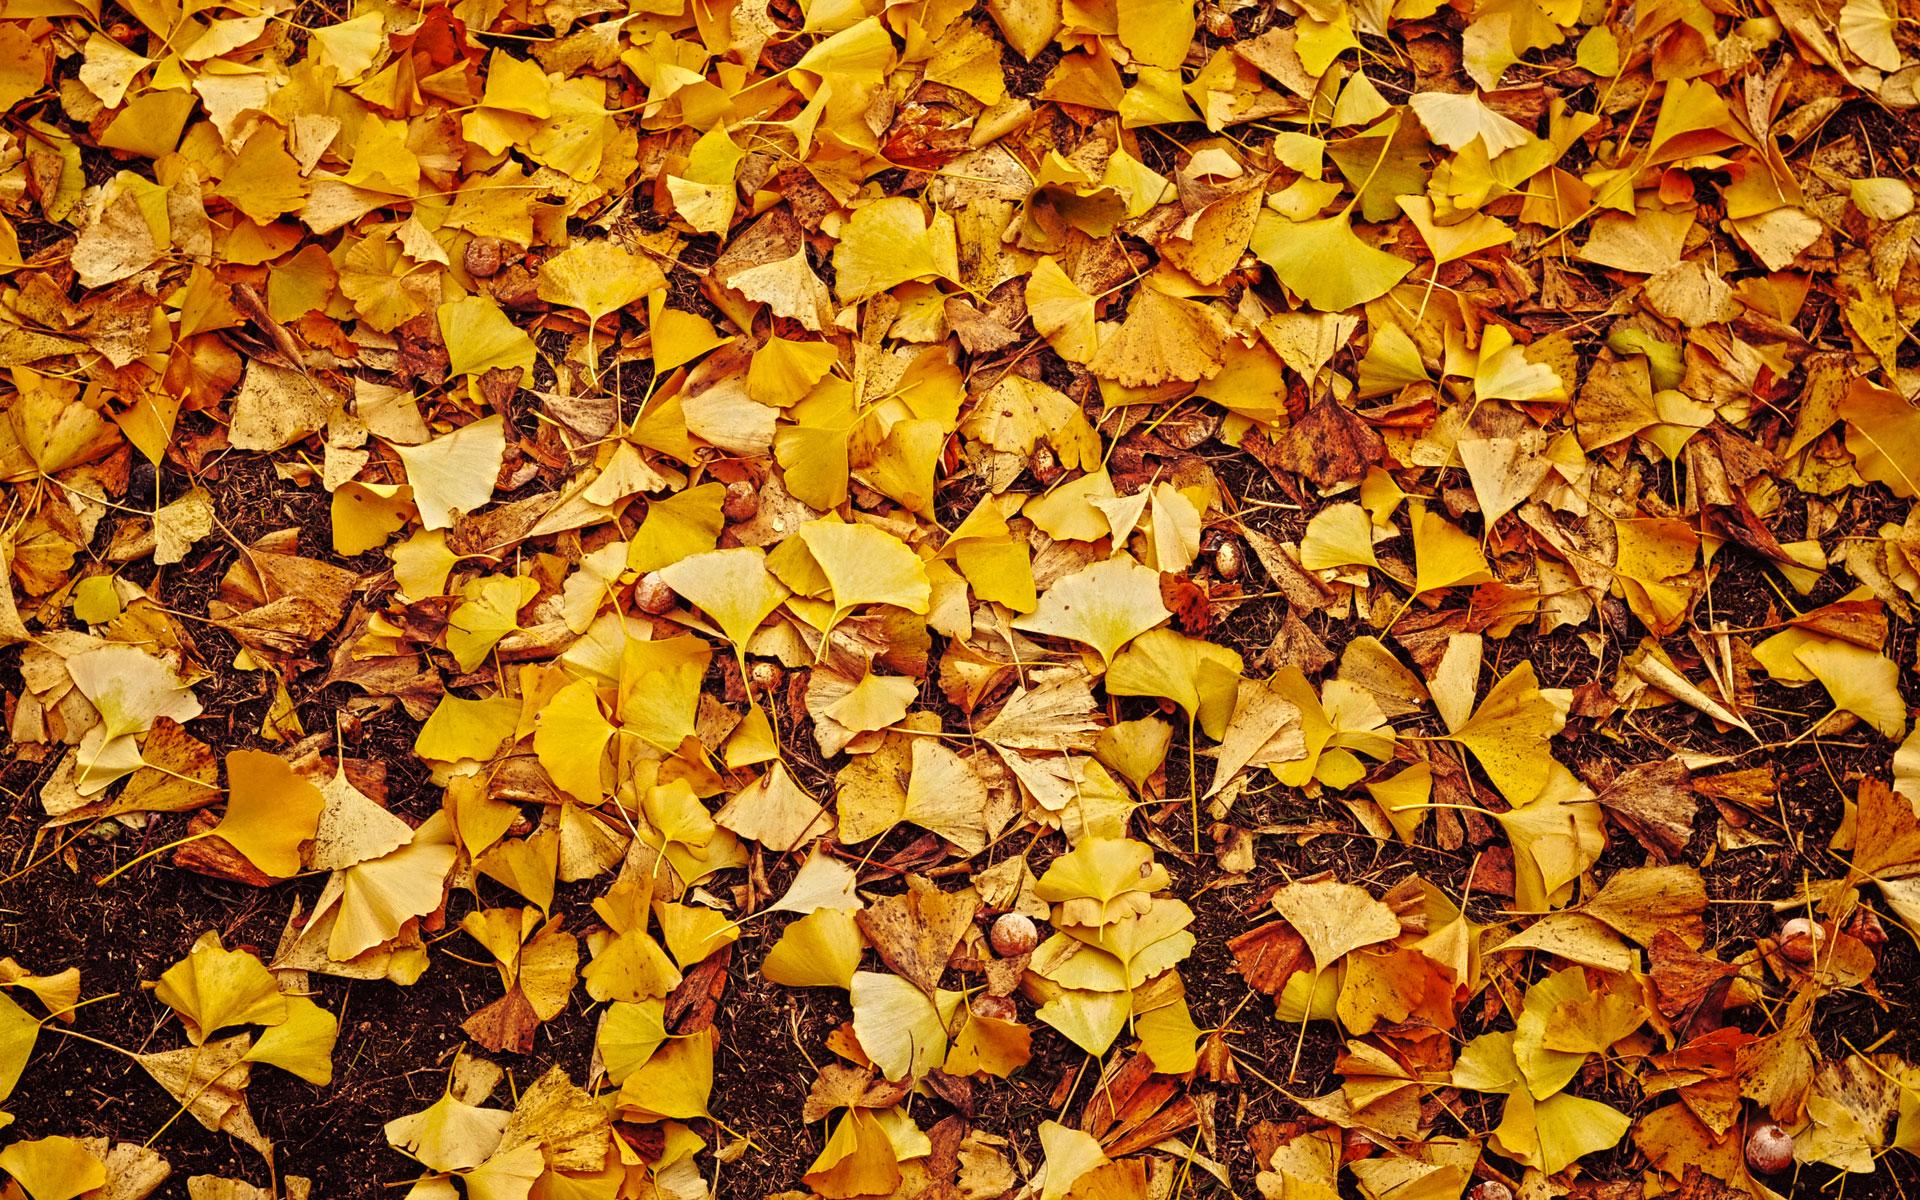 Falling Leaves Live Wallpaper Hd Autumn Leaves Wallpaper 33086 1920x1200px